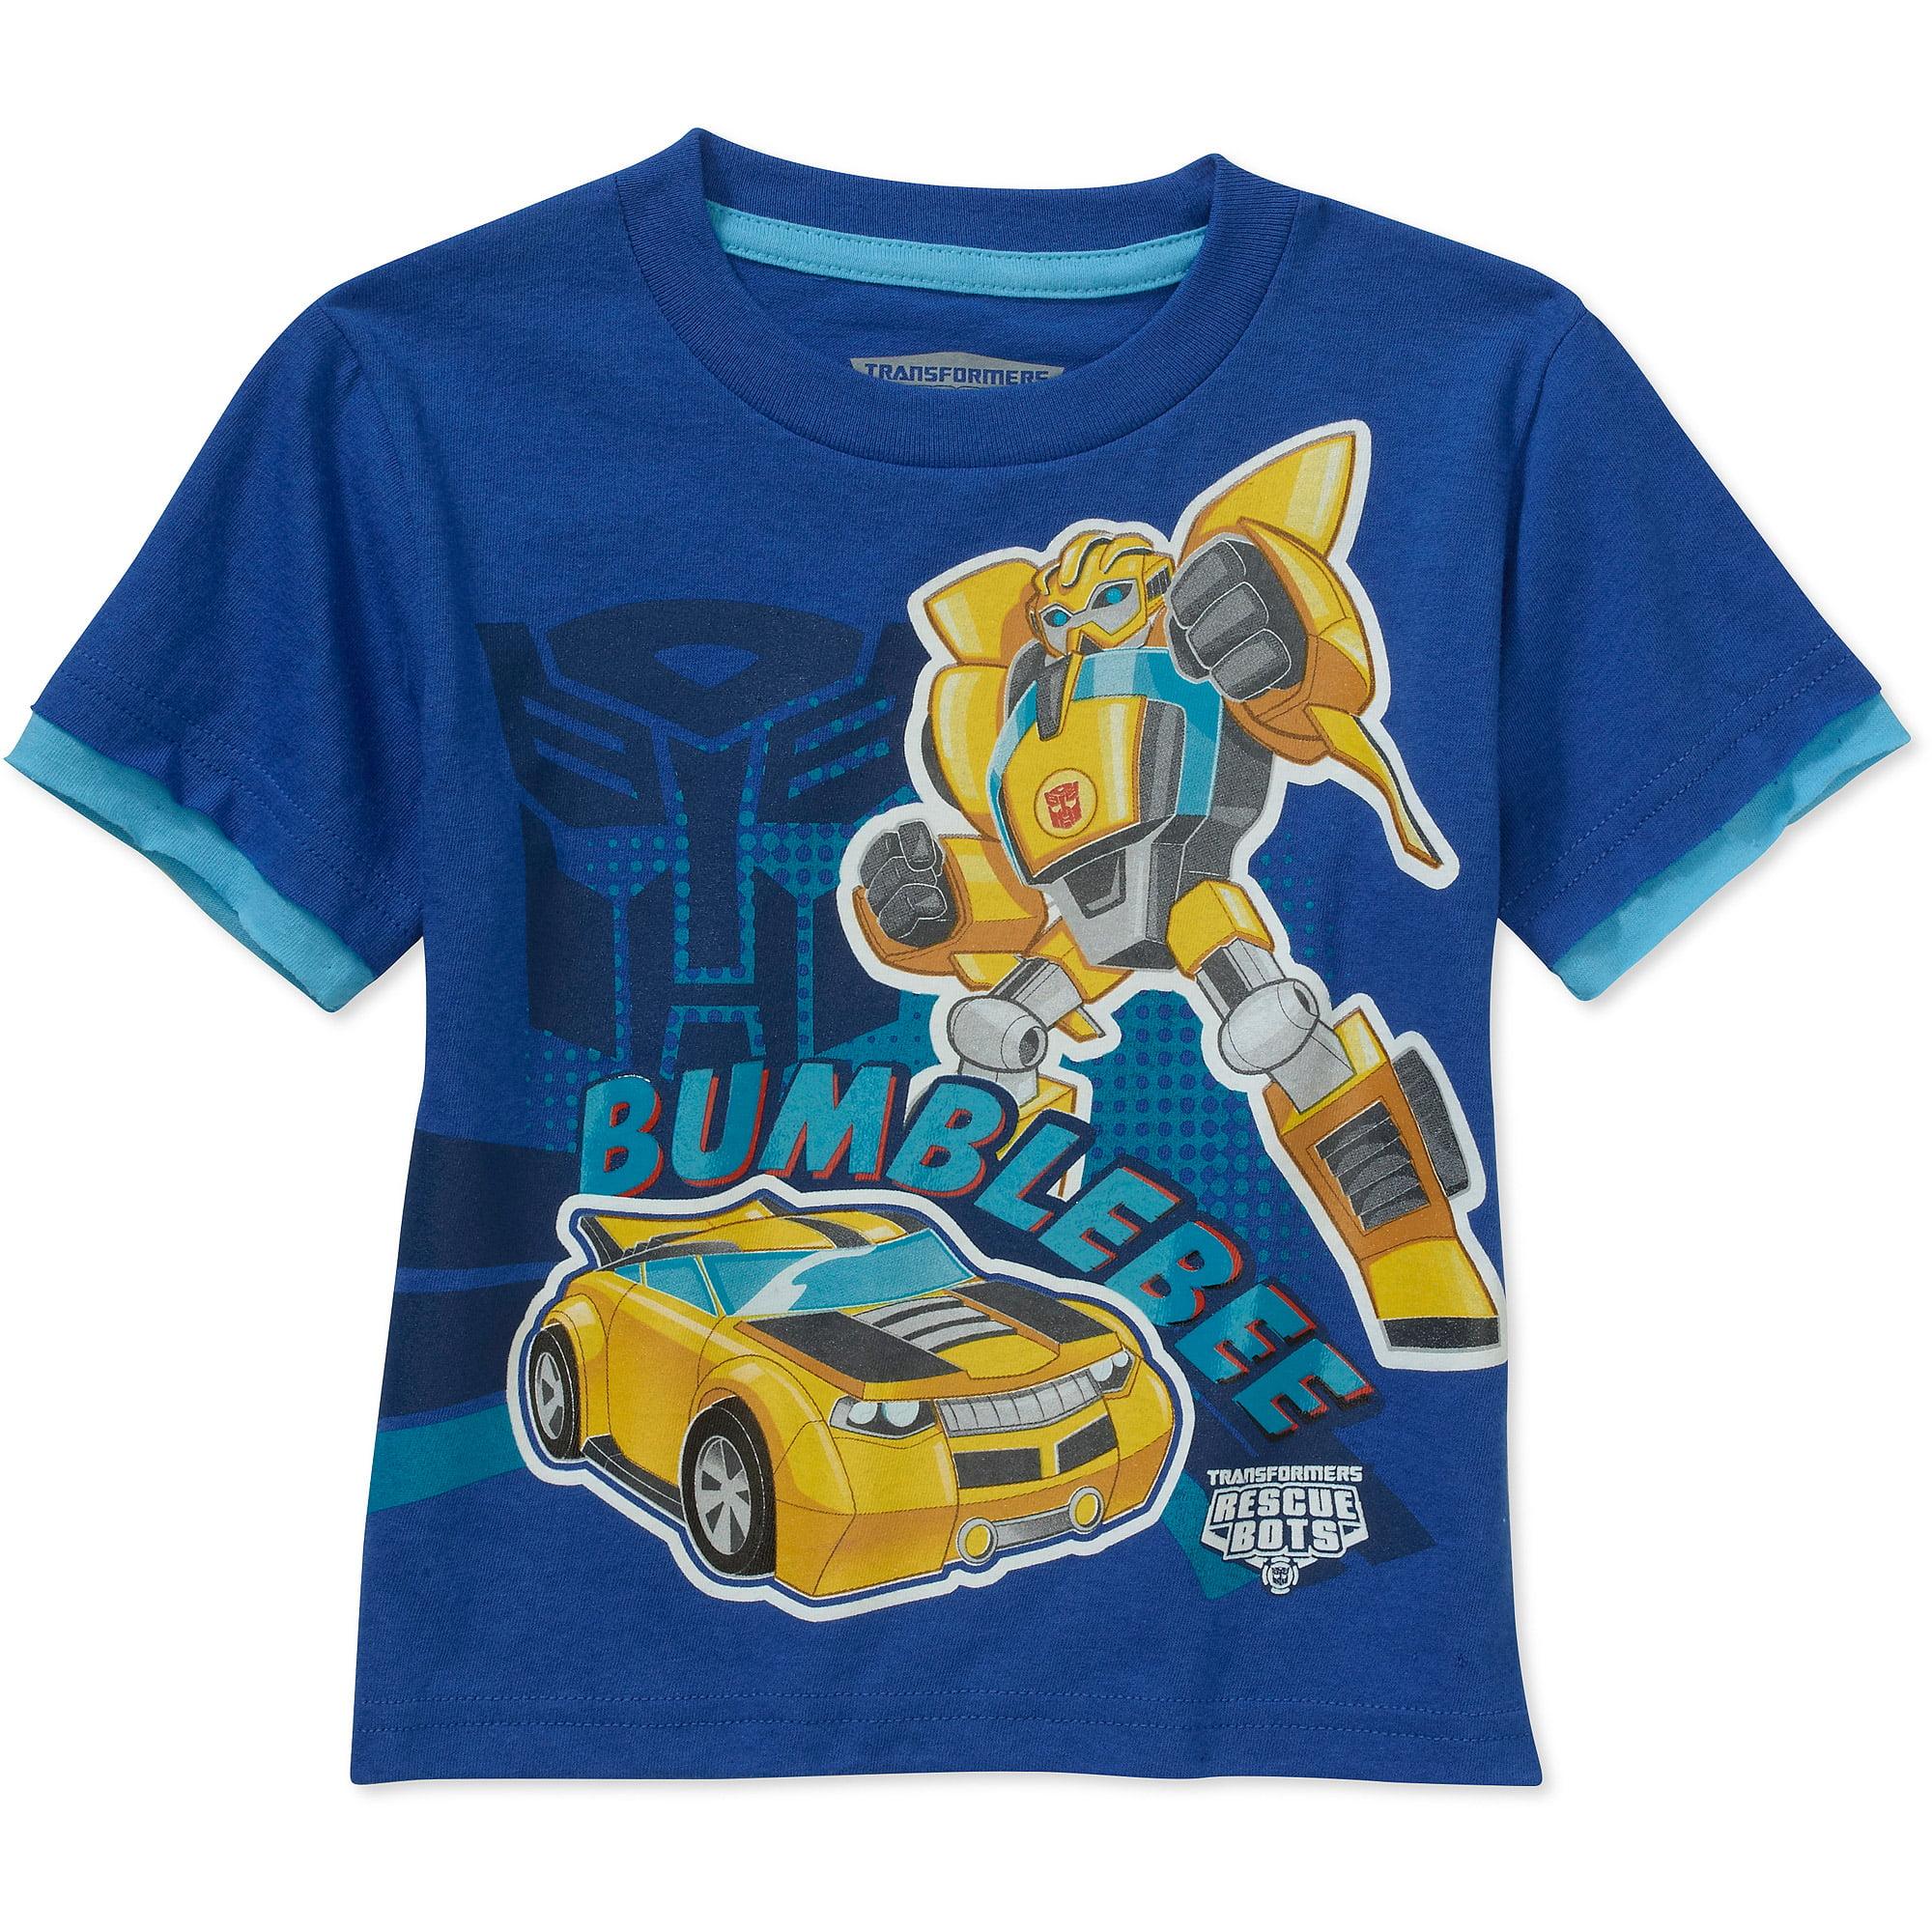 Transformers Toddler Boy Short Sleeve Tee